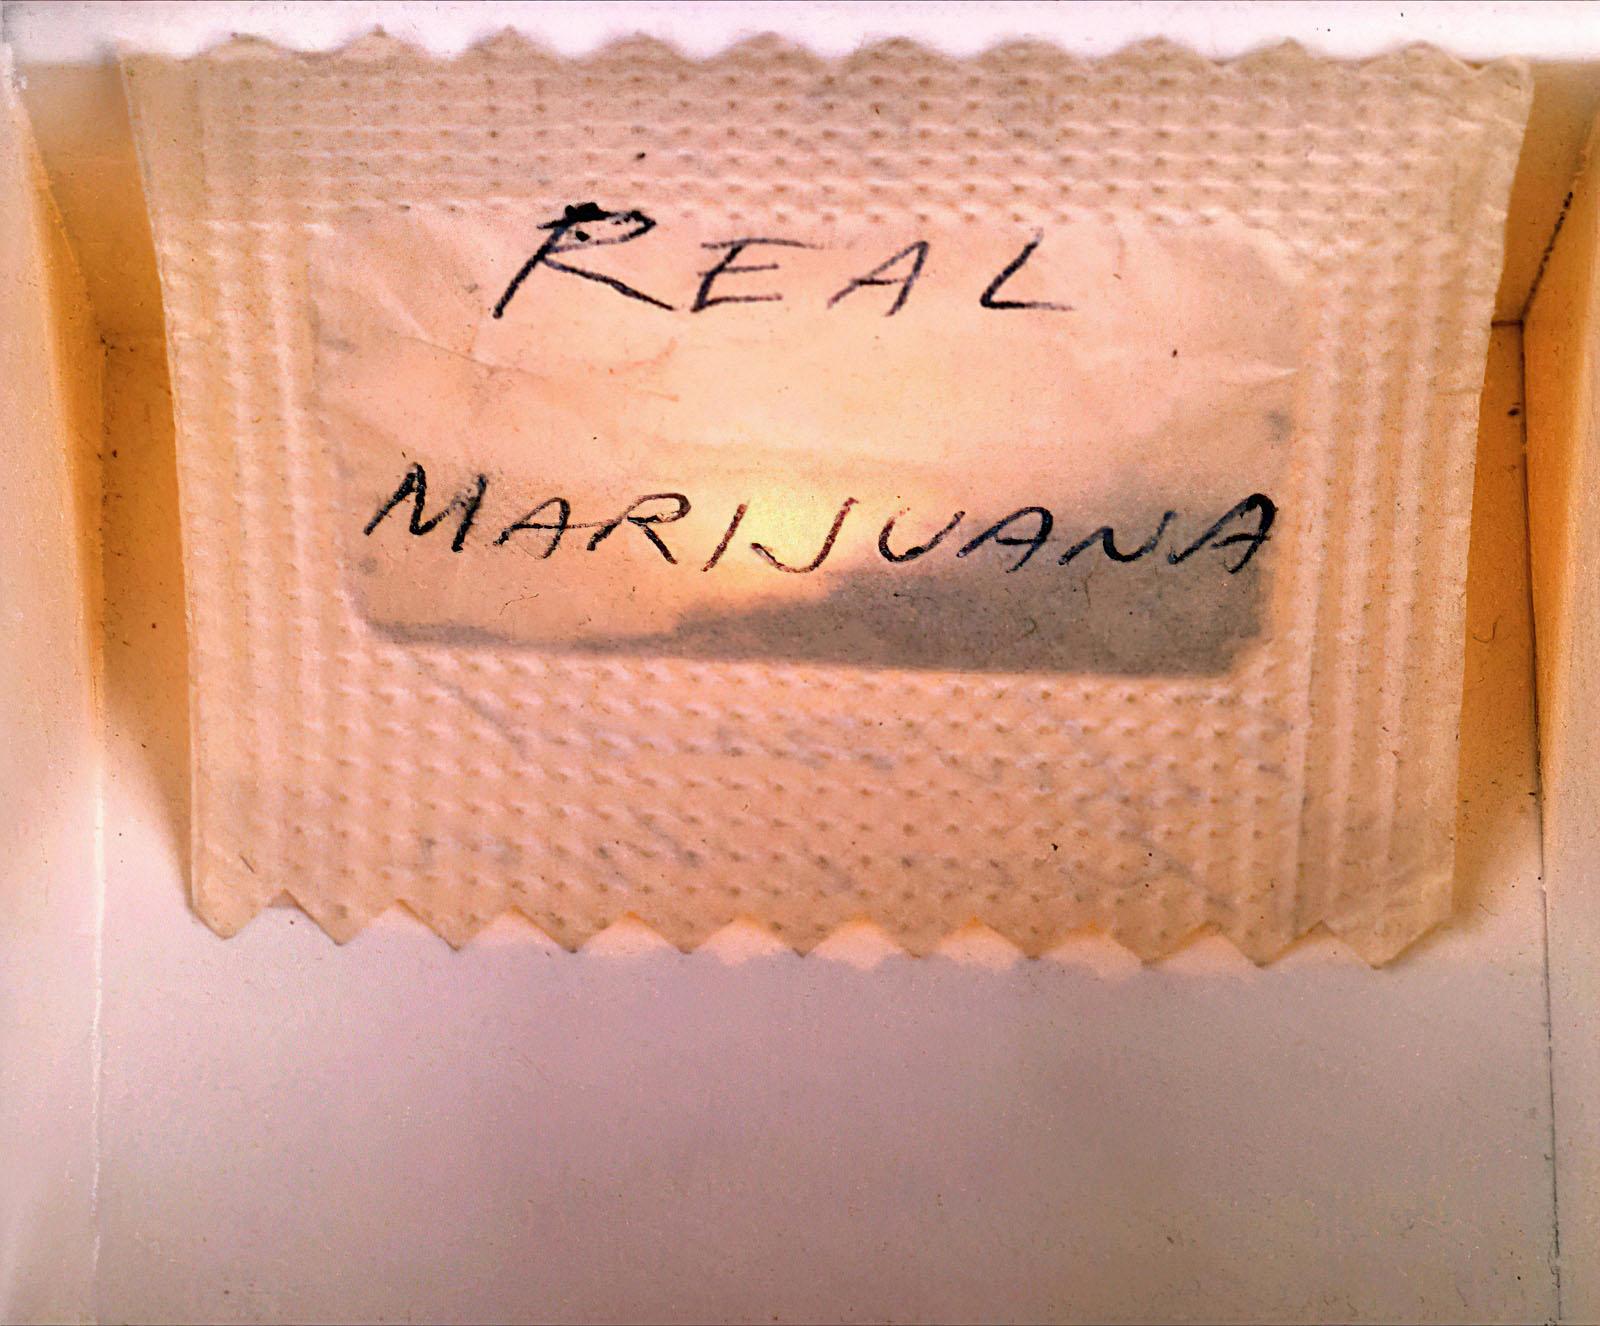 Ed Ruscha - Real Marijuana